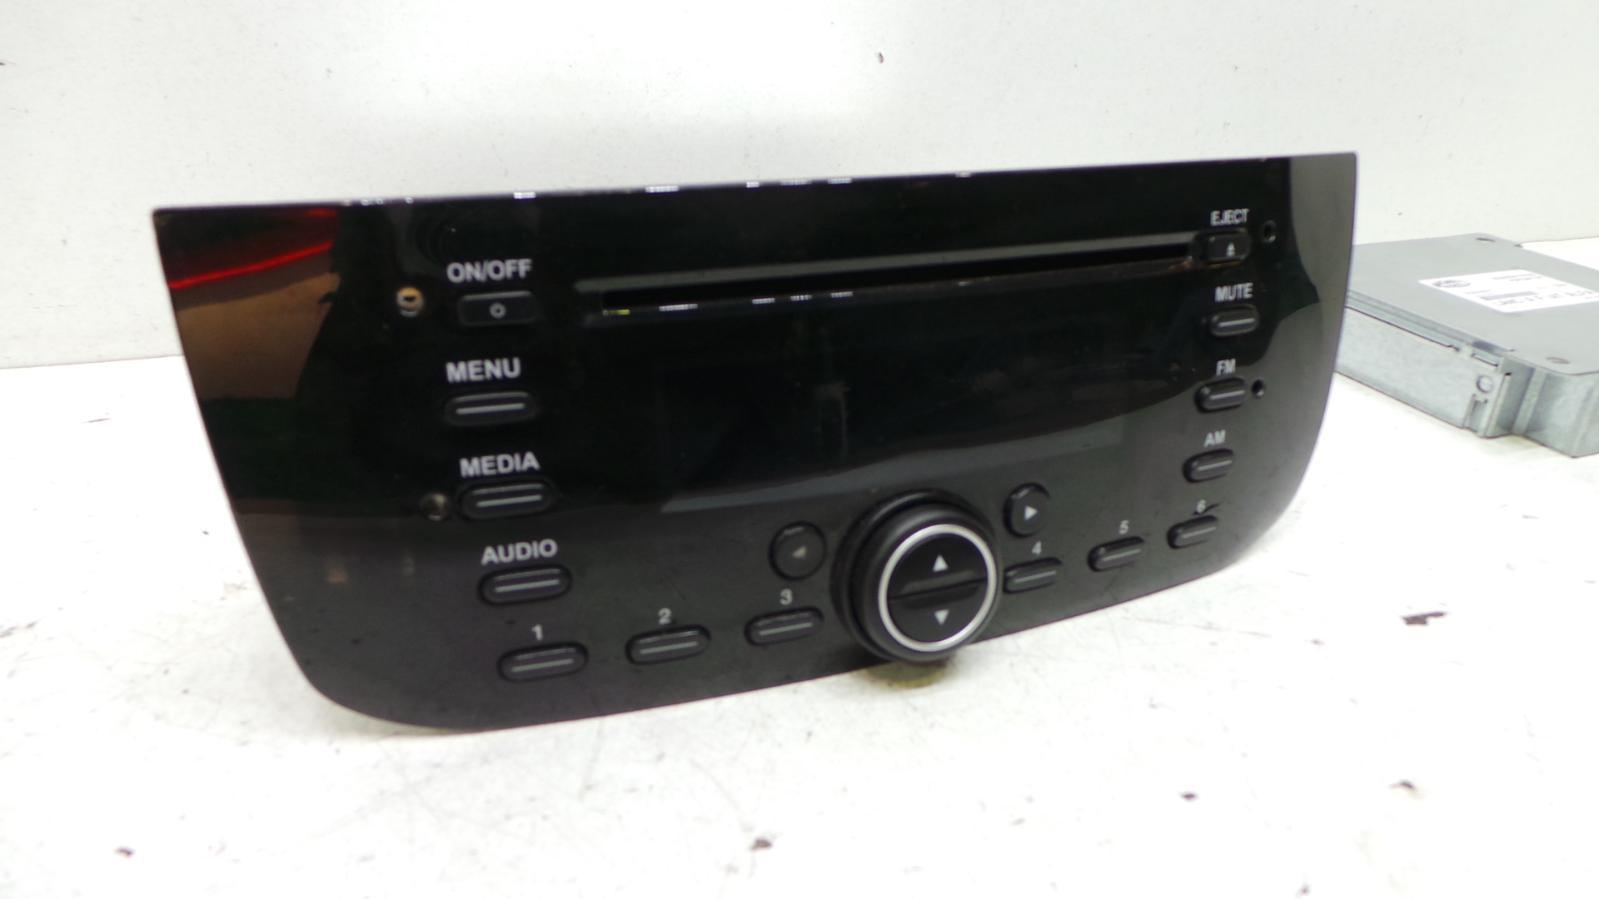 2010 fiat punto evo cd player radio radio ecu. Black Bedroom Furniture Sets. Home Design Ideas